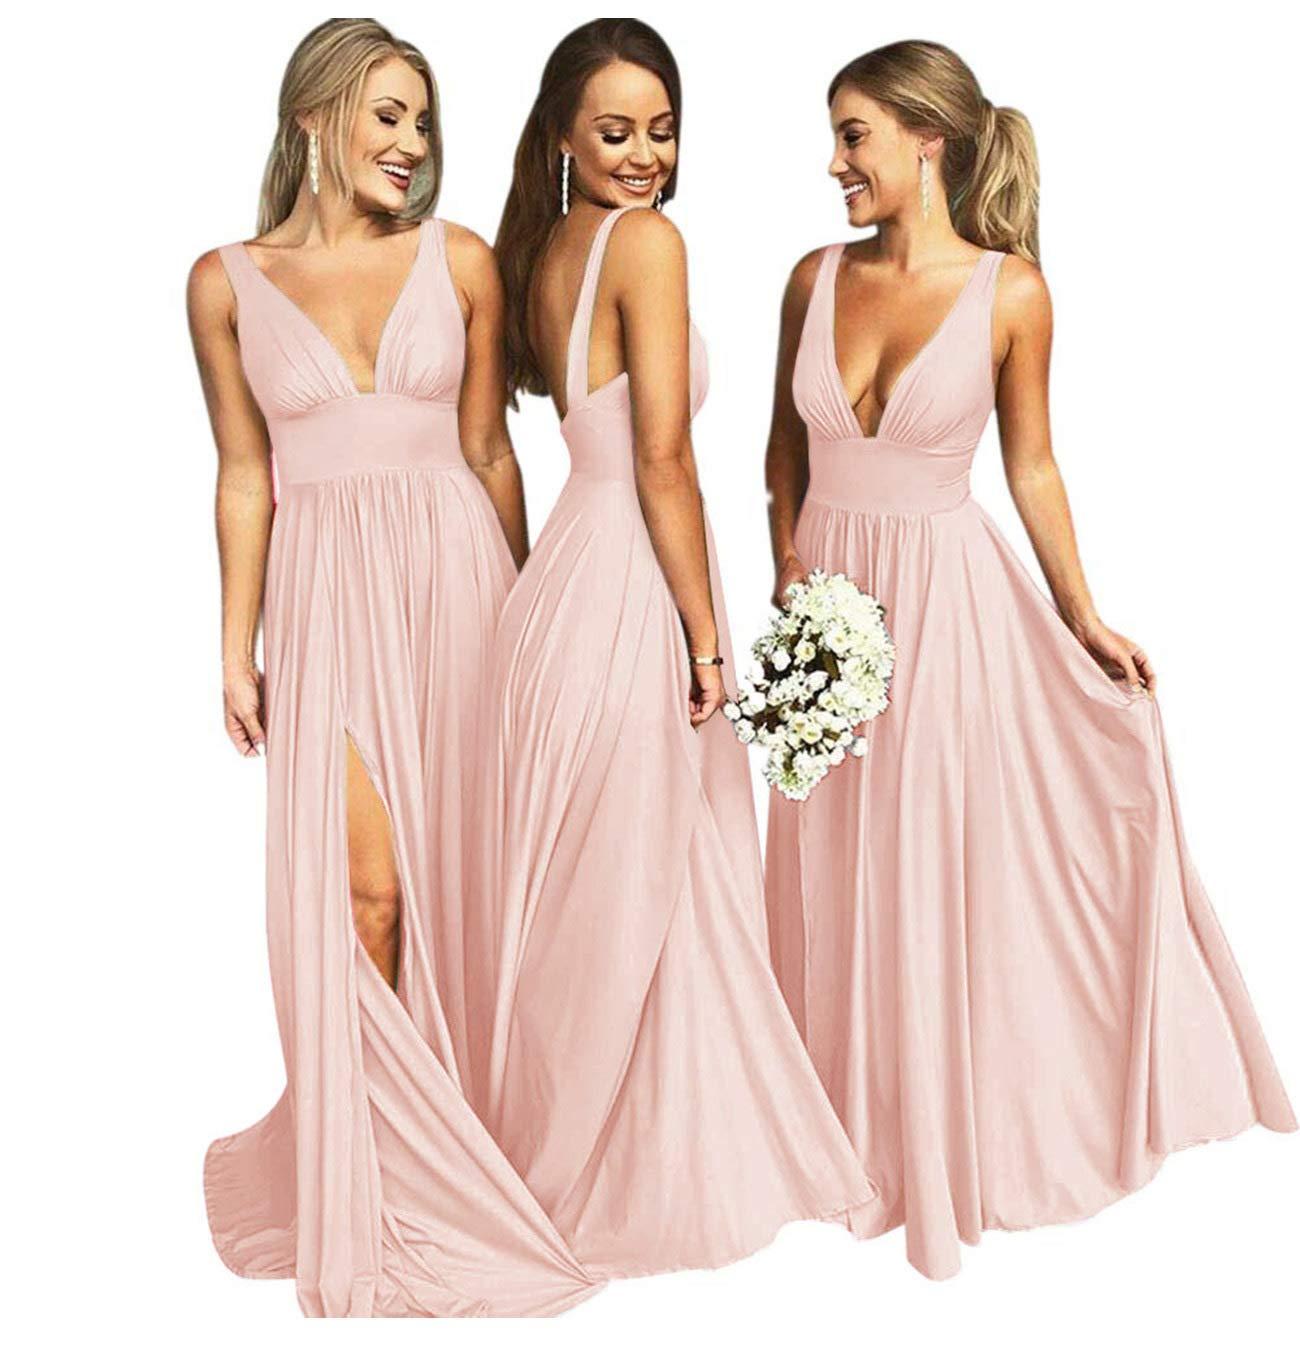 Bridesmaid Dresses Long V Neck Backless Split Beach Wedding Evening Prom Dress For Women Blush Size2